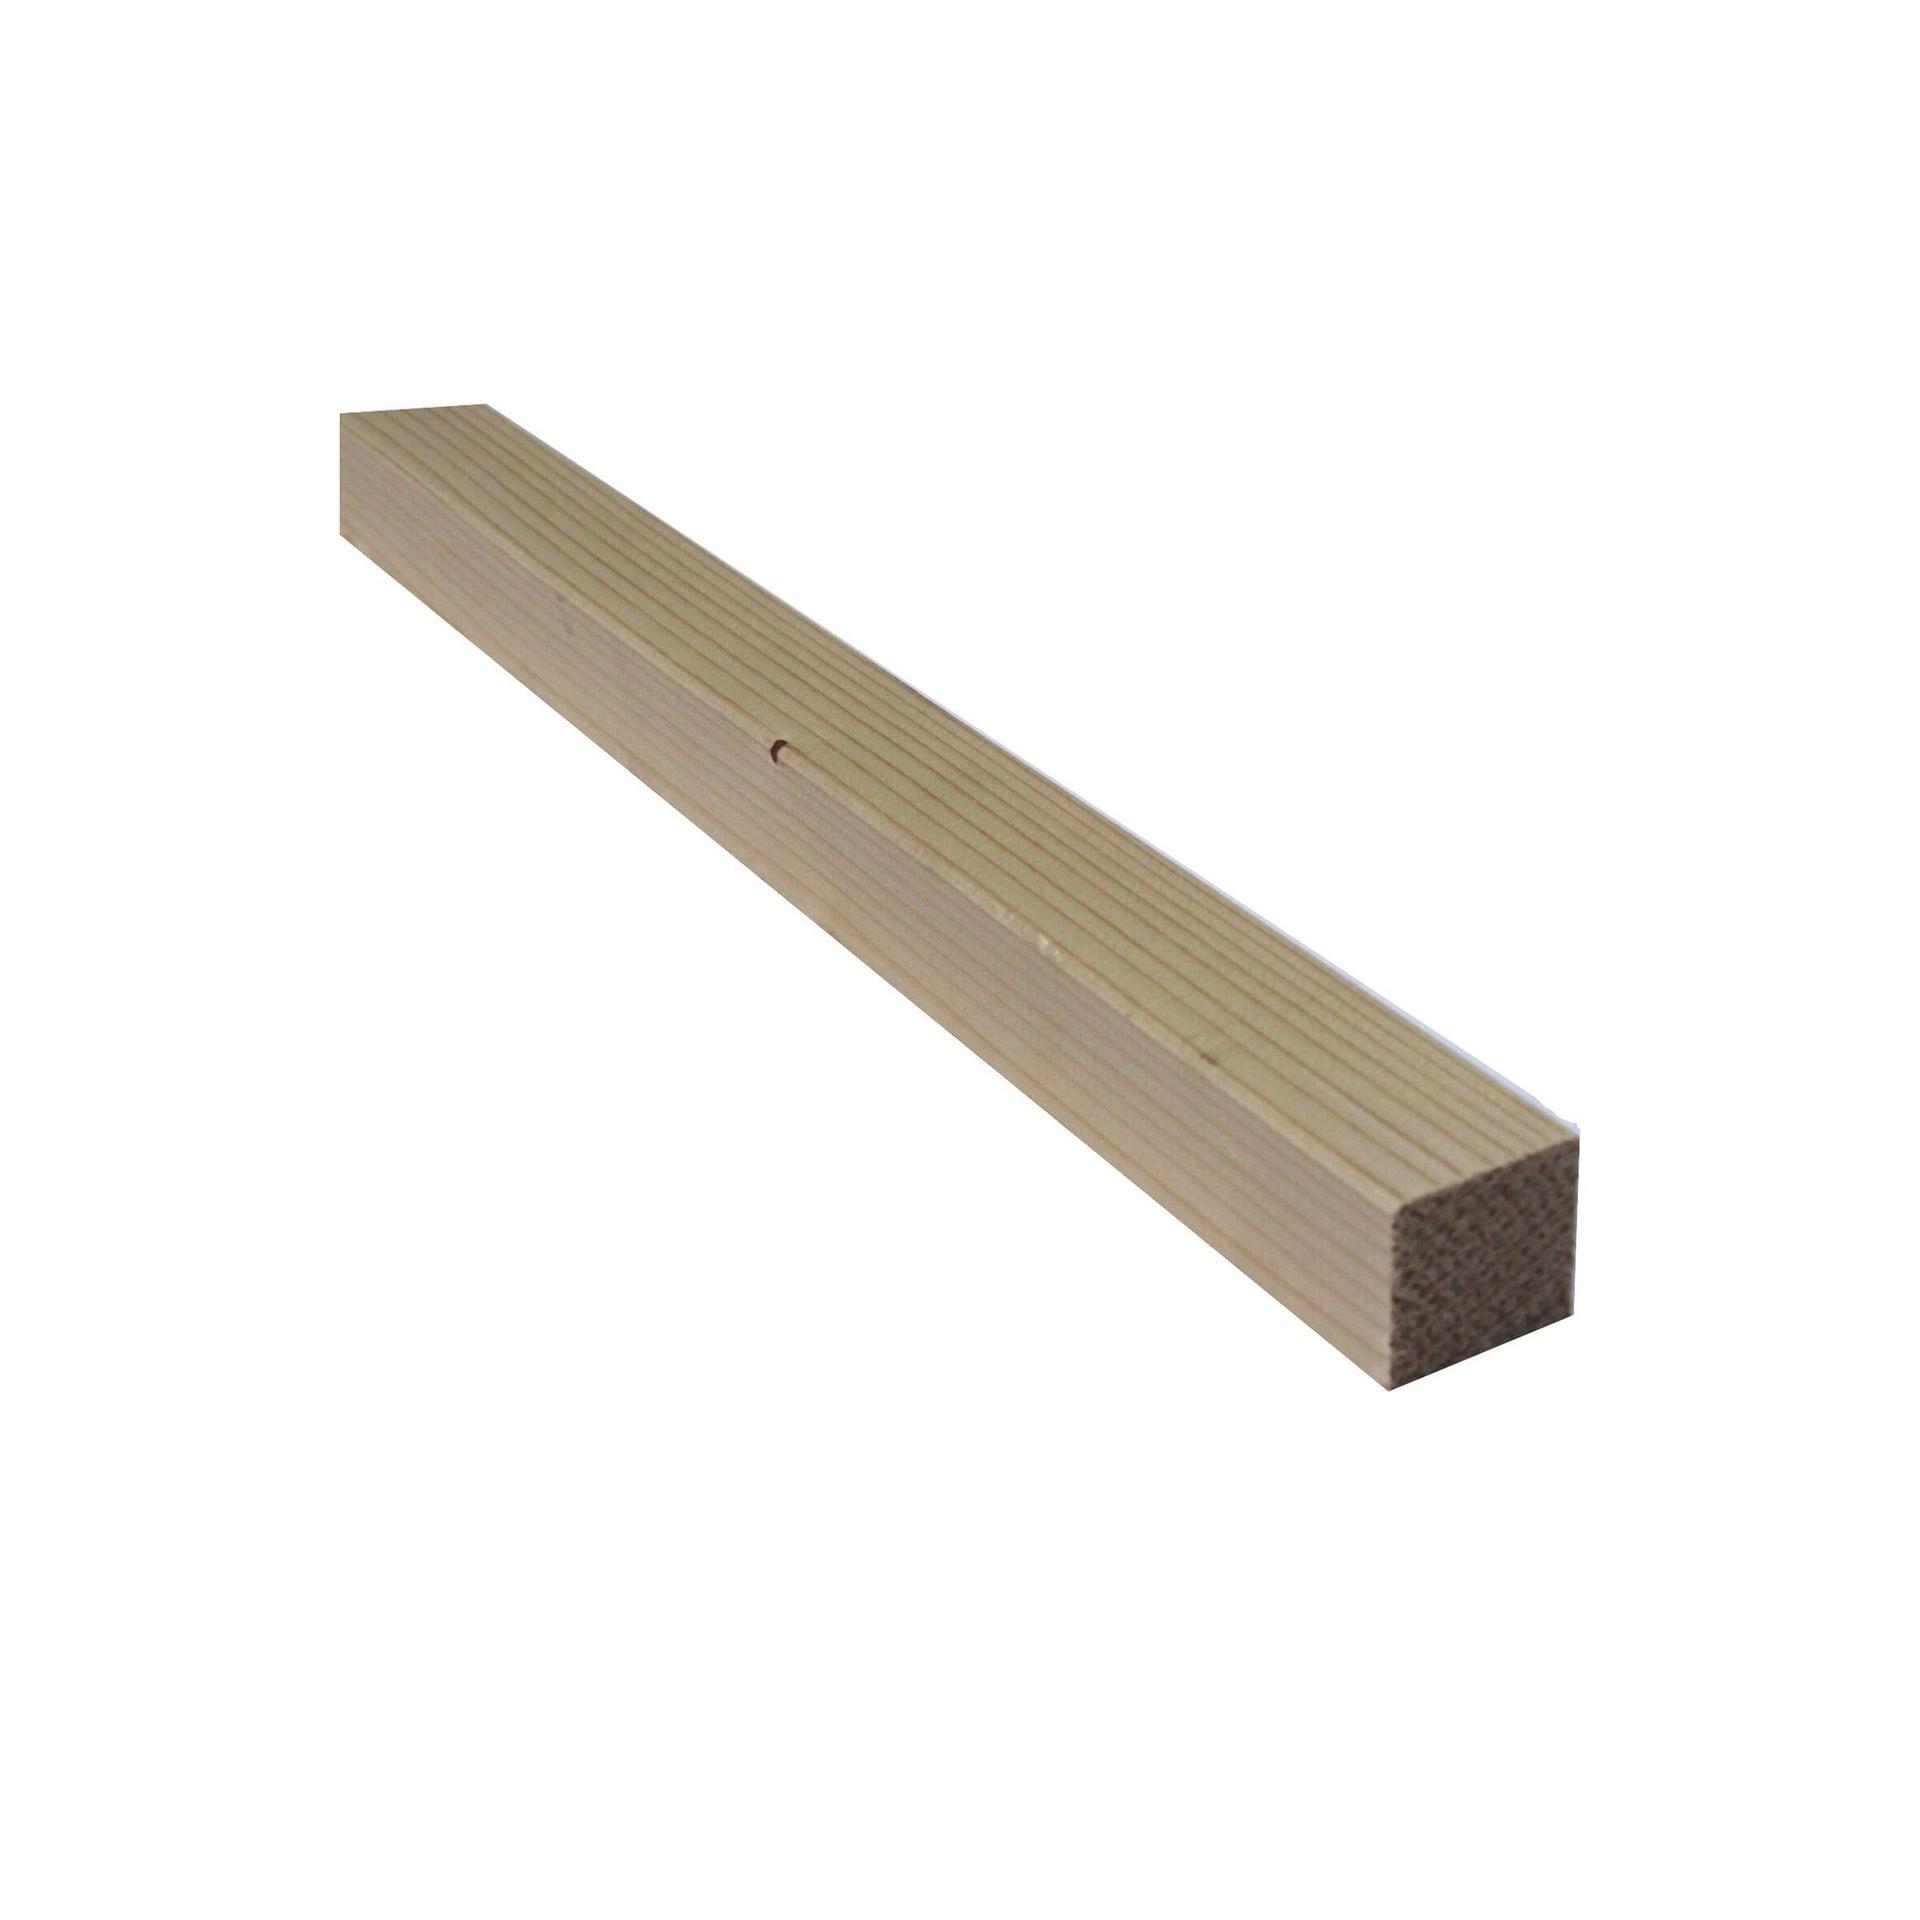 Listello piallato abete 3 m x 29 mm, Sp 29 mm